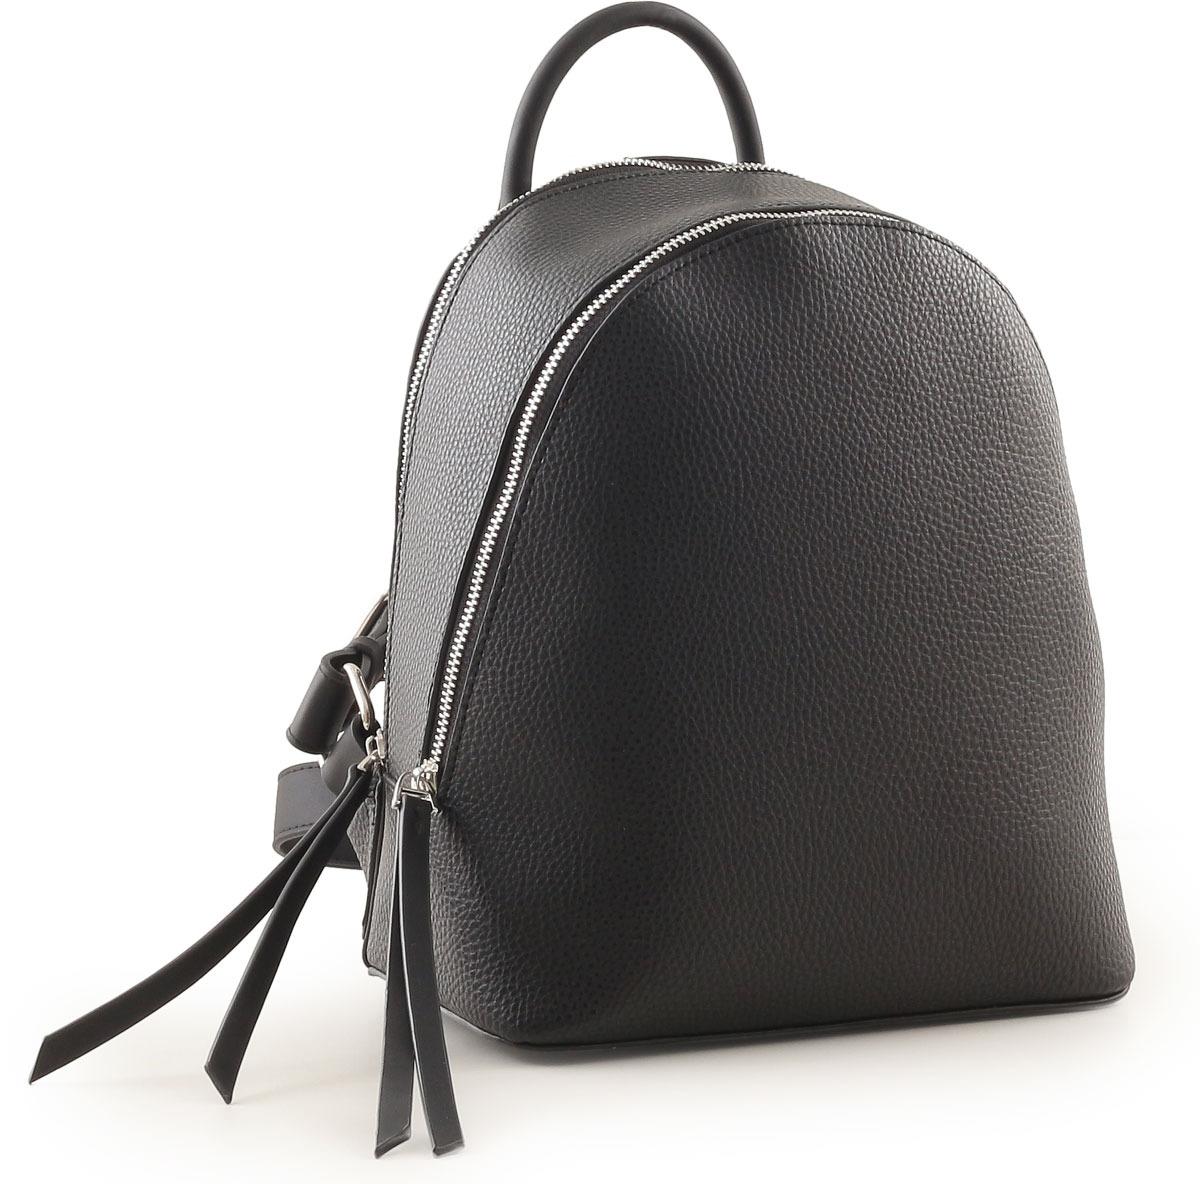 Сумка женская Miss Unique Алче, цвет: черный. 2020 MU сумка женская miss unique алче цвет пурпурный 2015 mu